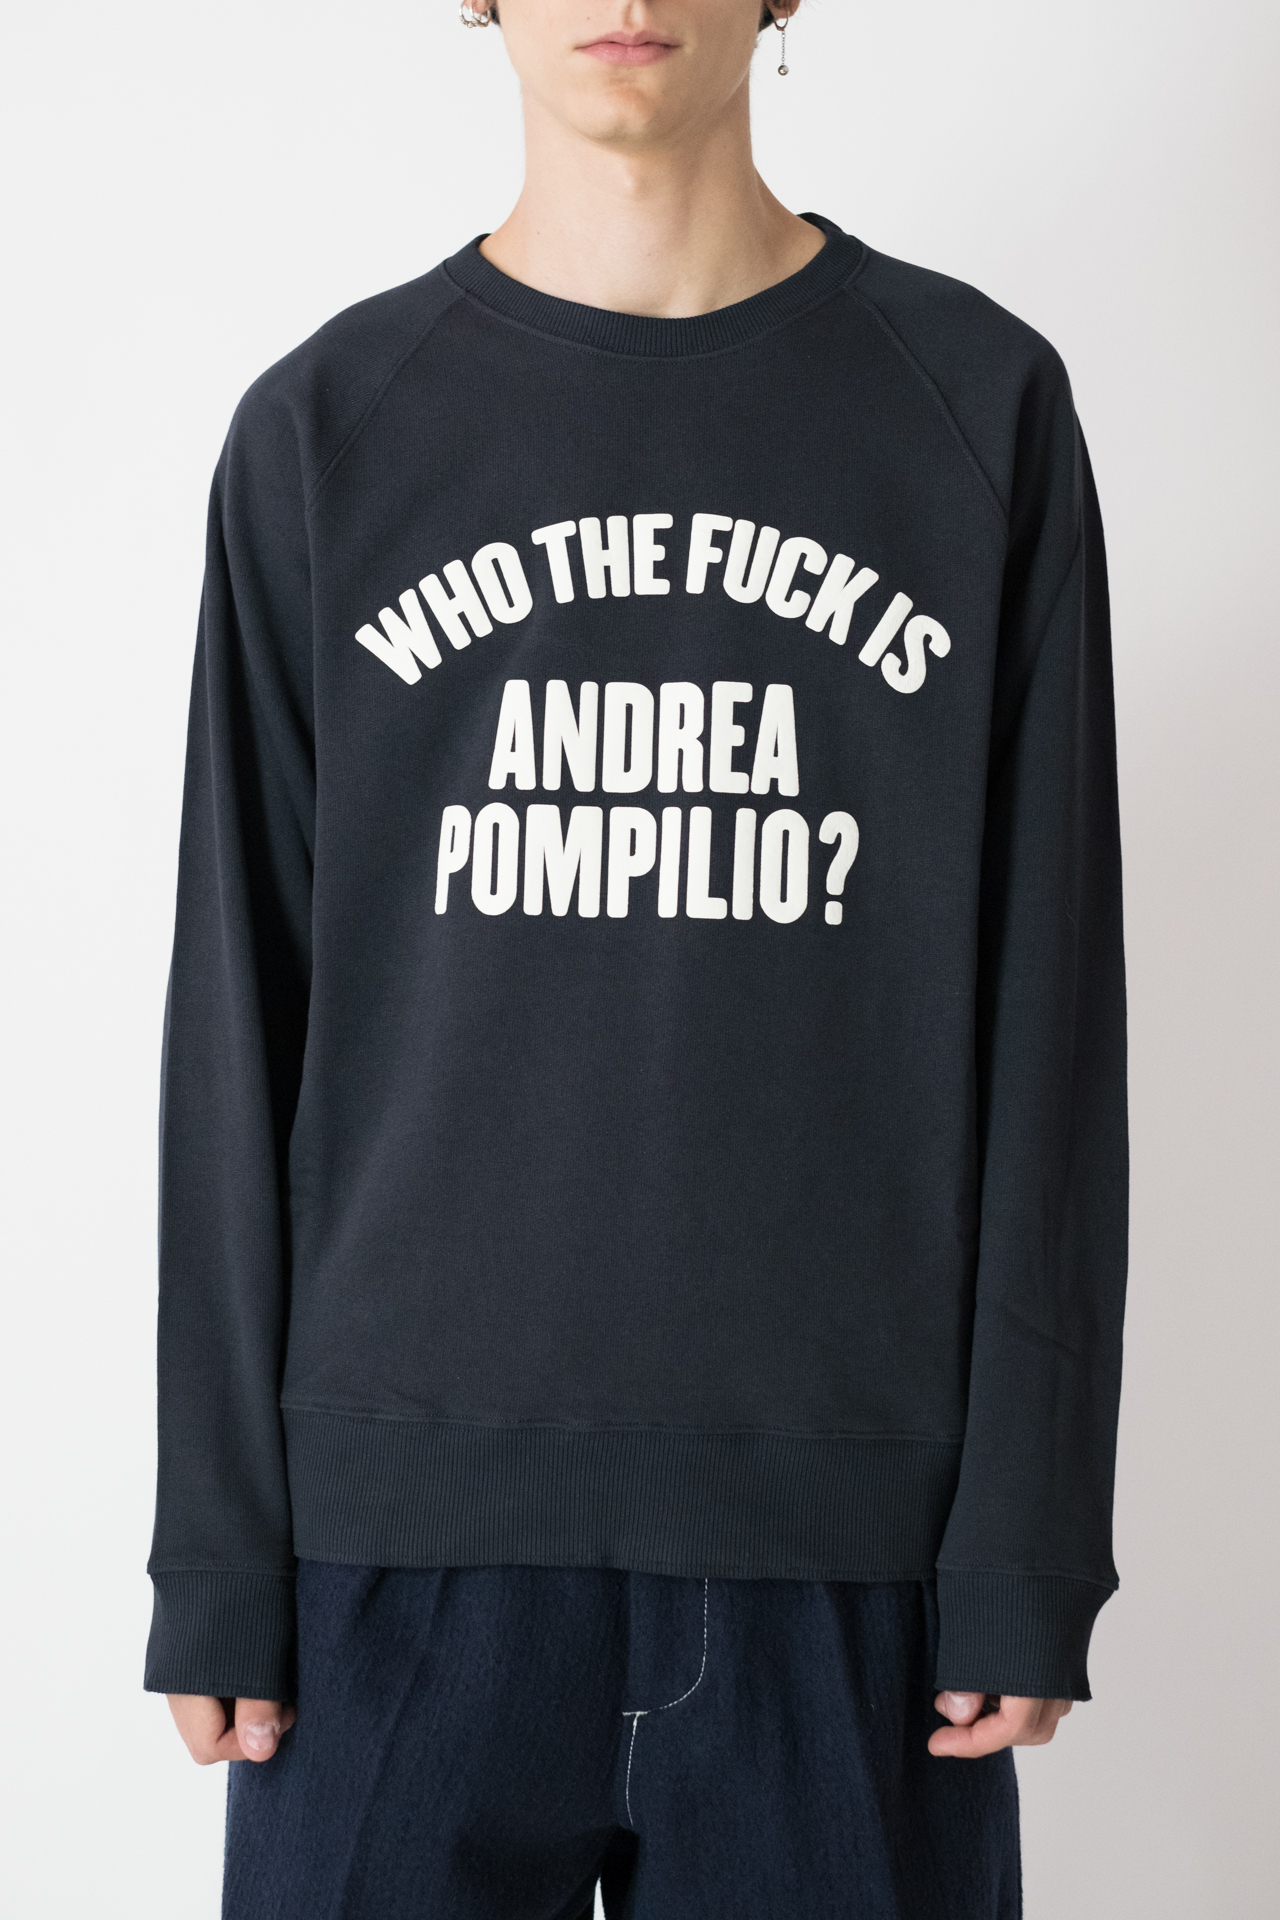 Andrea Pompilio Swatshirts Ondak